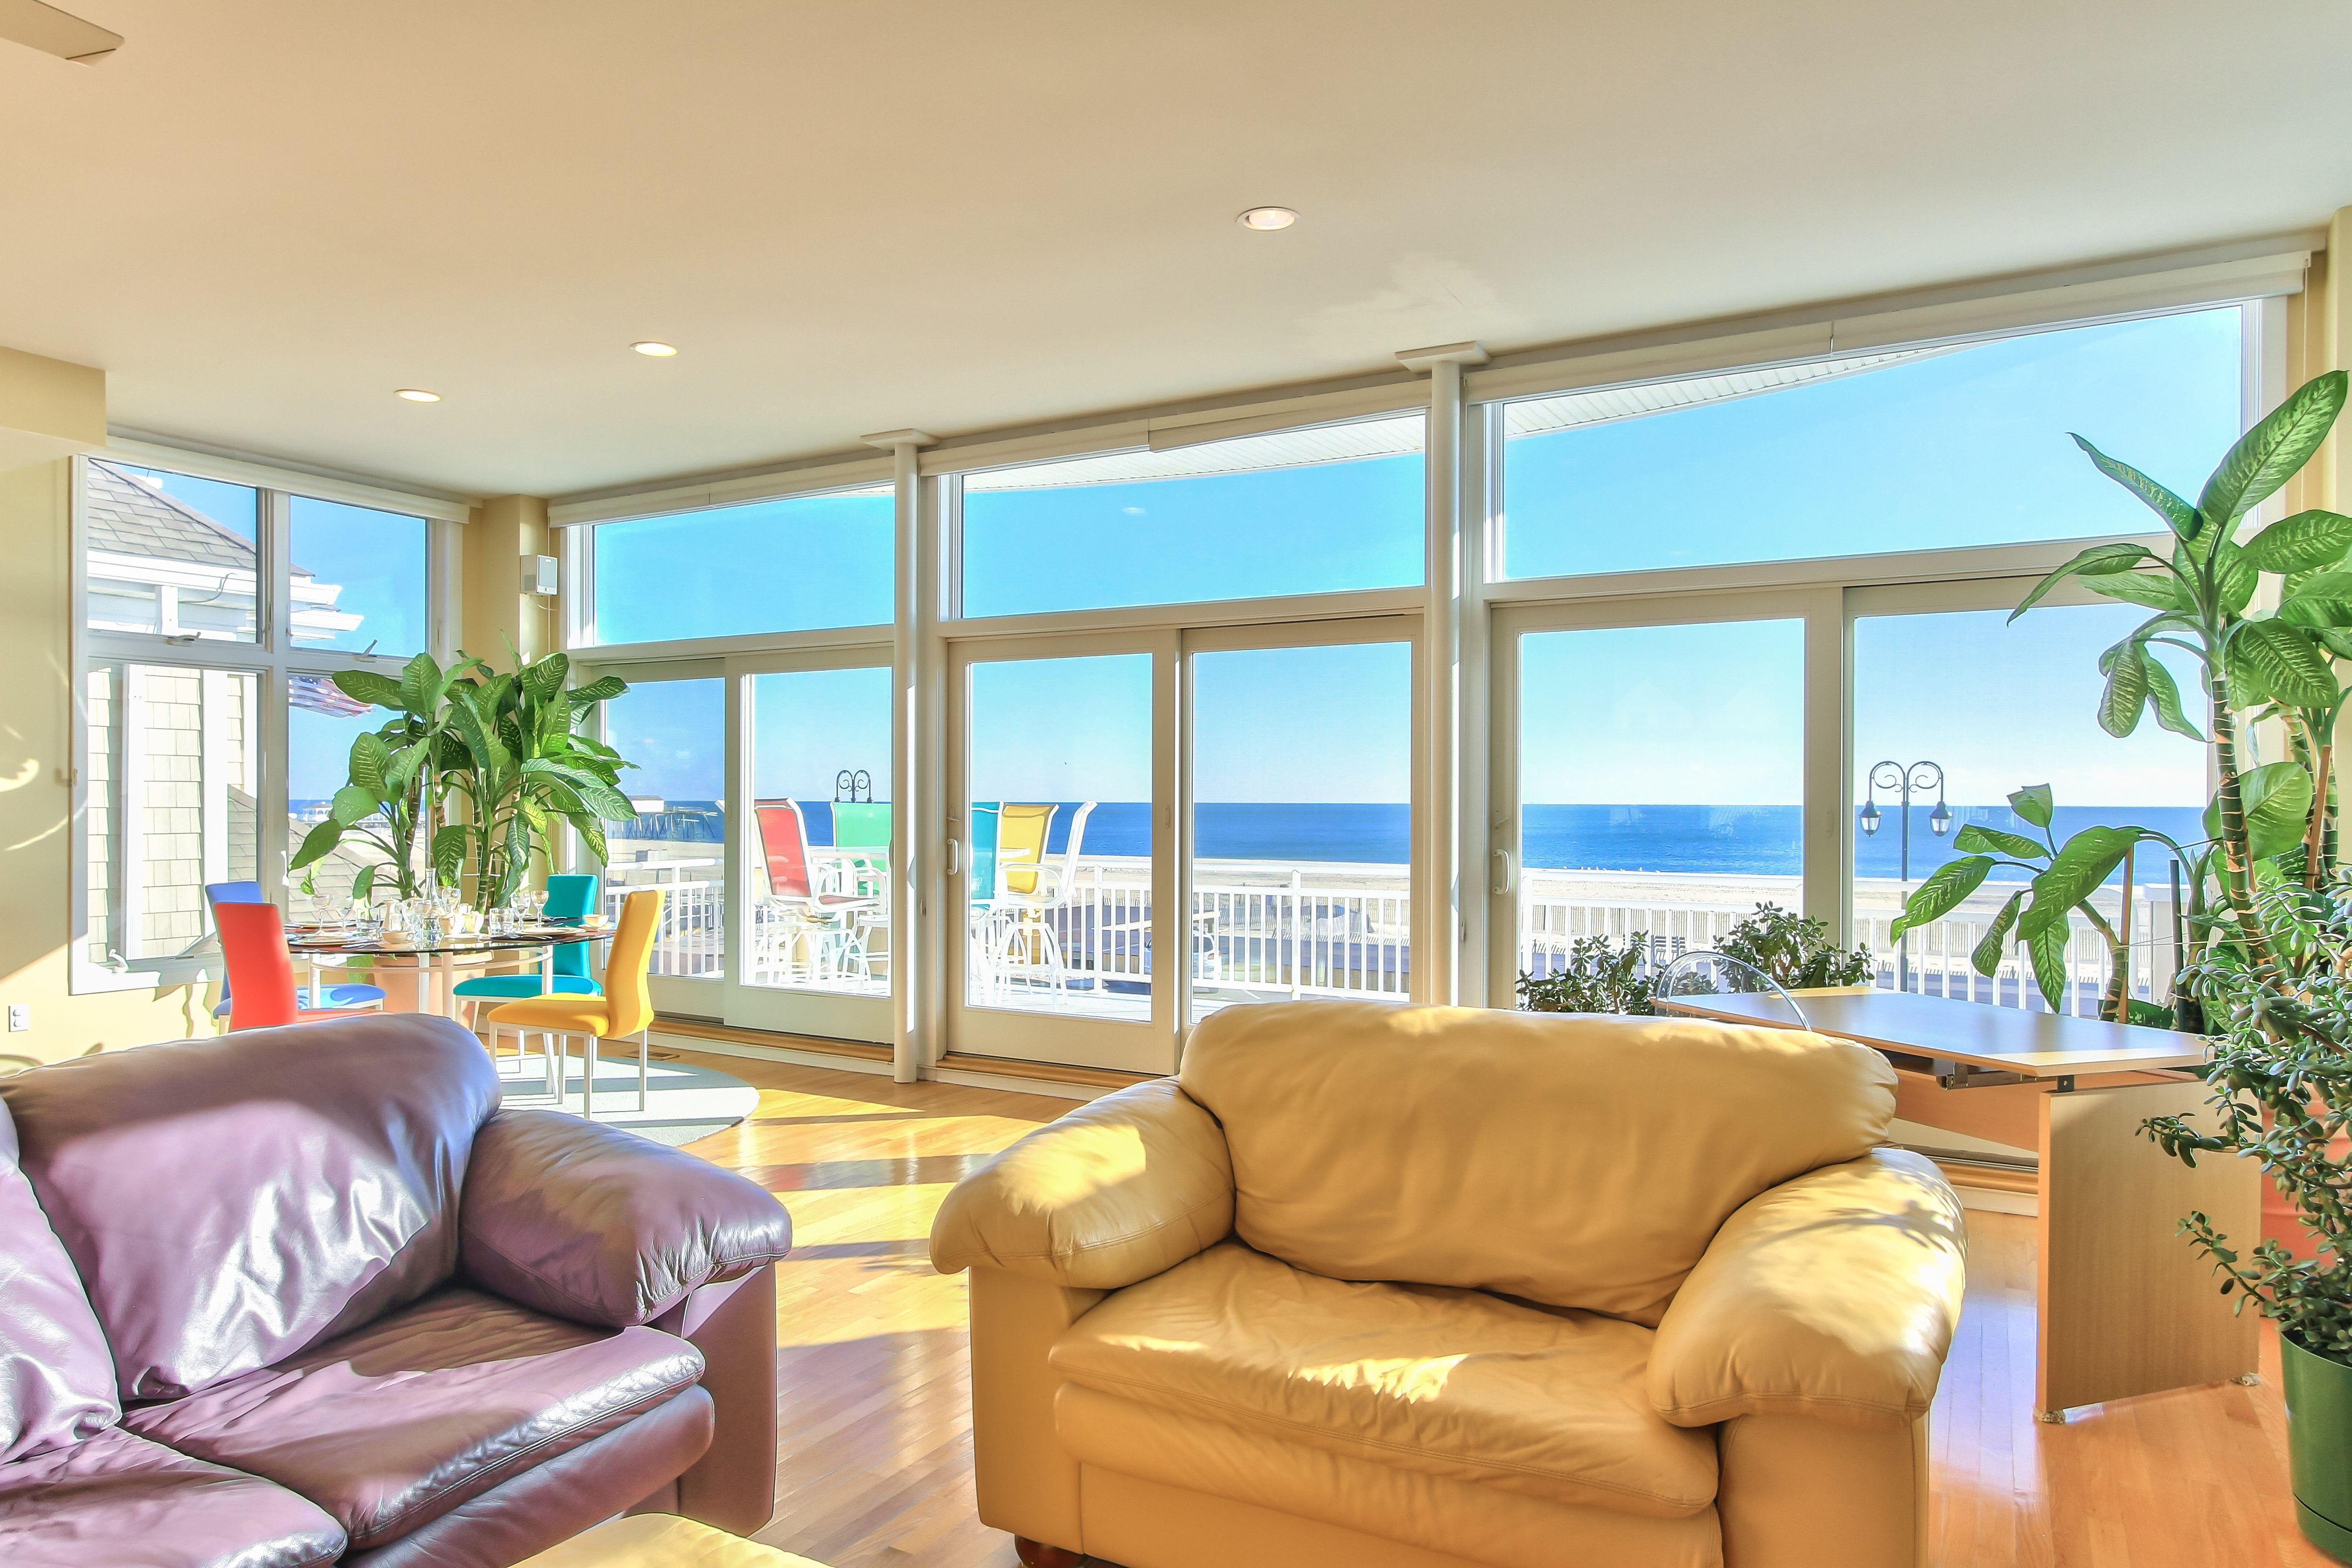 Photo 3 of 11 in coastal contemporary 10 modern seaside